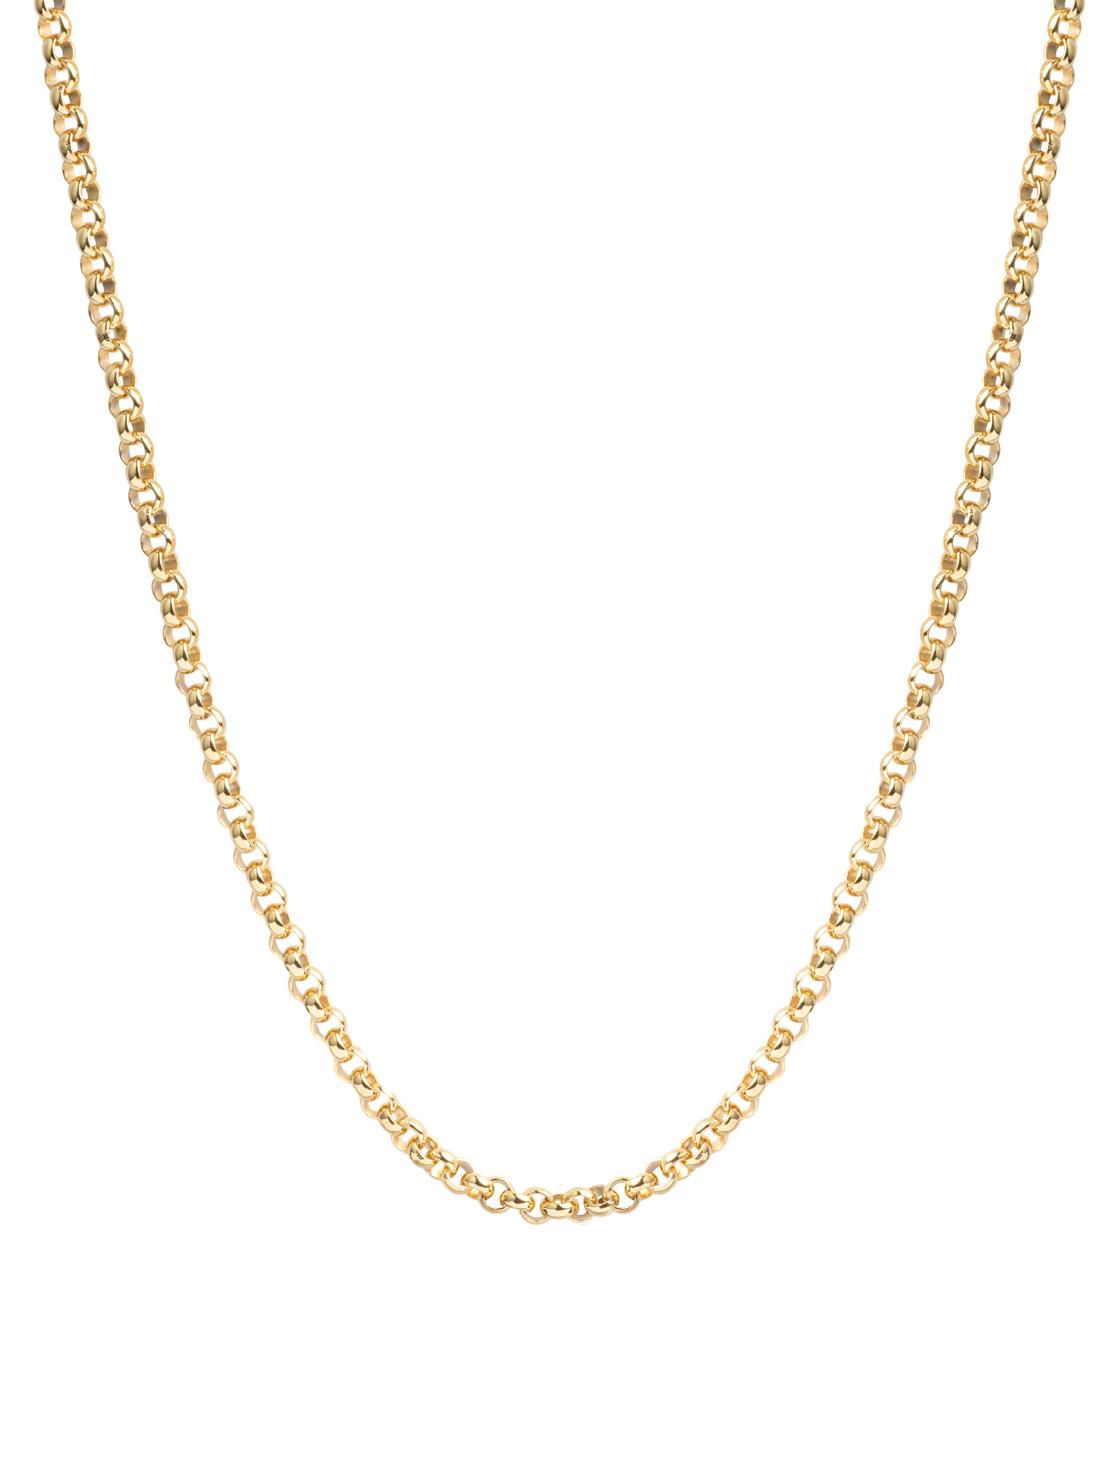 Thick Gold Belcher Chain